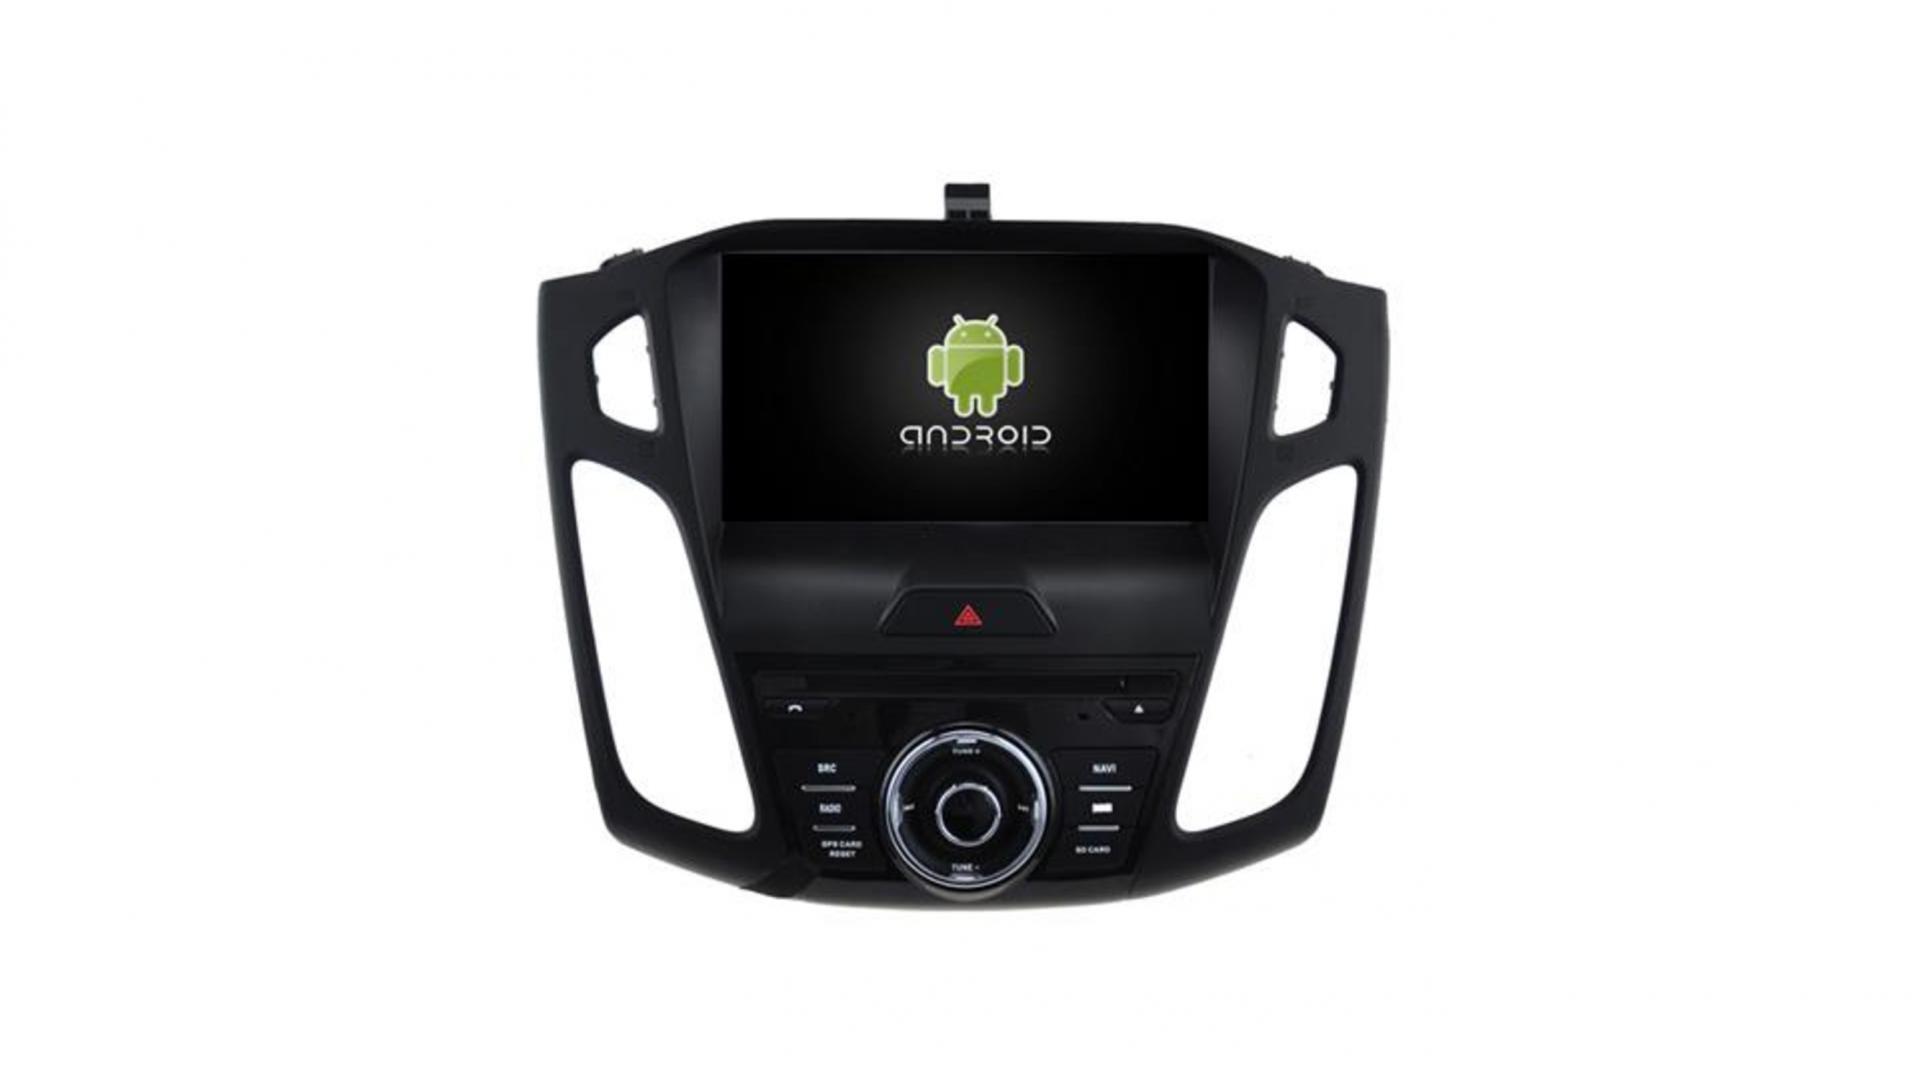 Ford focus autoradio gps bluetooth android auto carplay camera de recul commande au volant1